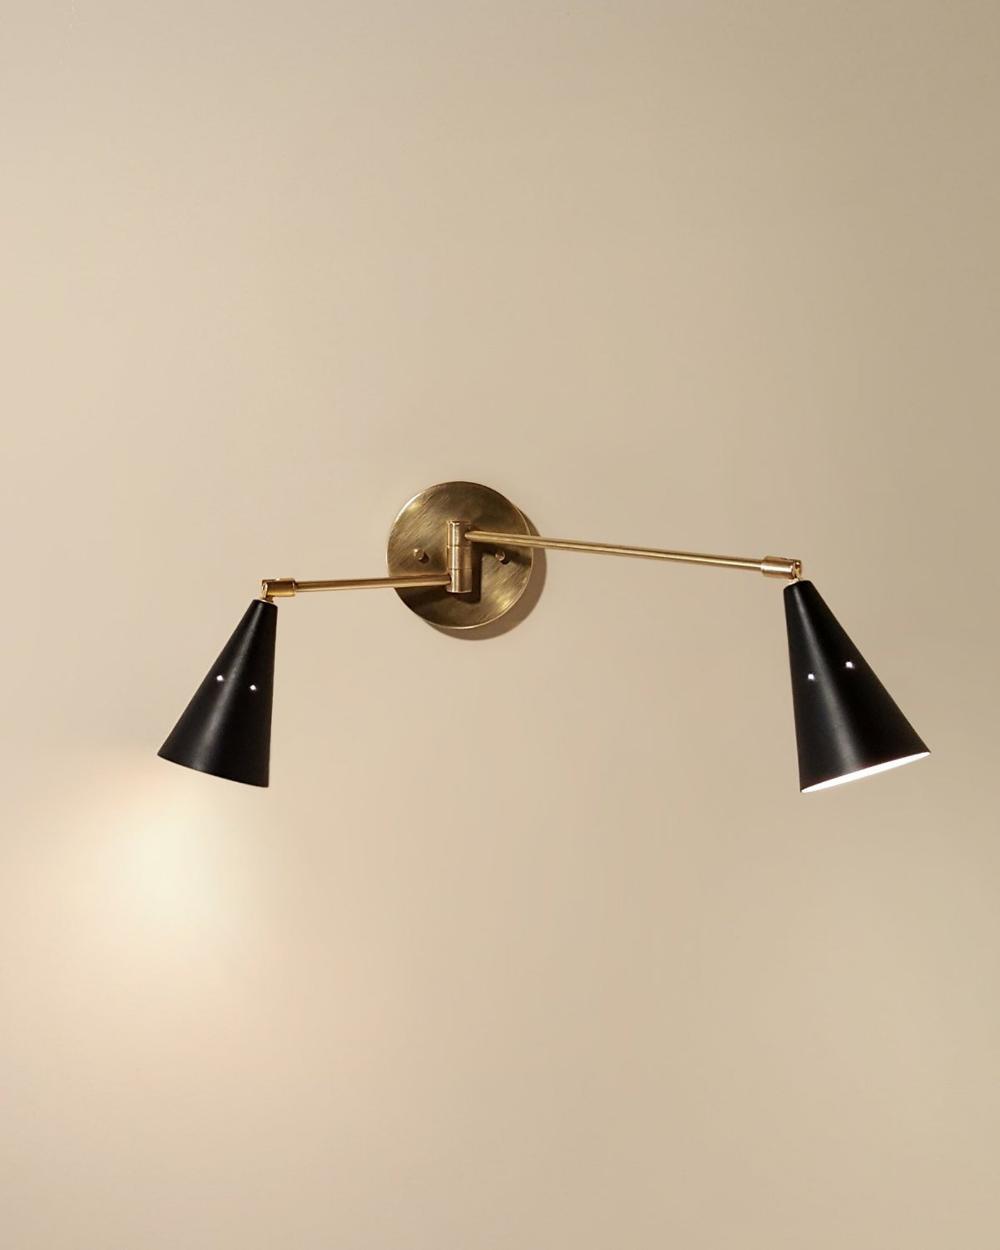 Task Dual Swing Arm Spotlight Adjustable Swivel Wall Sconce Etsy Wall Lamps Bedroom Midcentury Wall Sconces Modern Light Fixtures